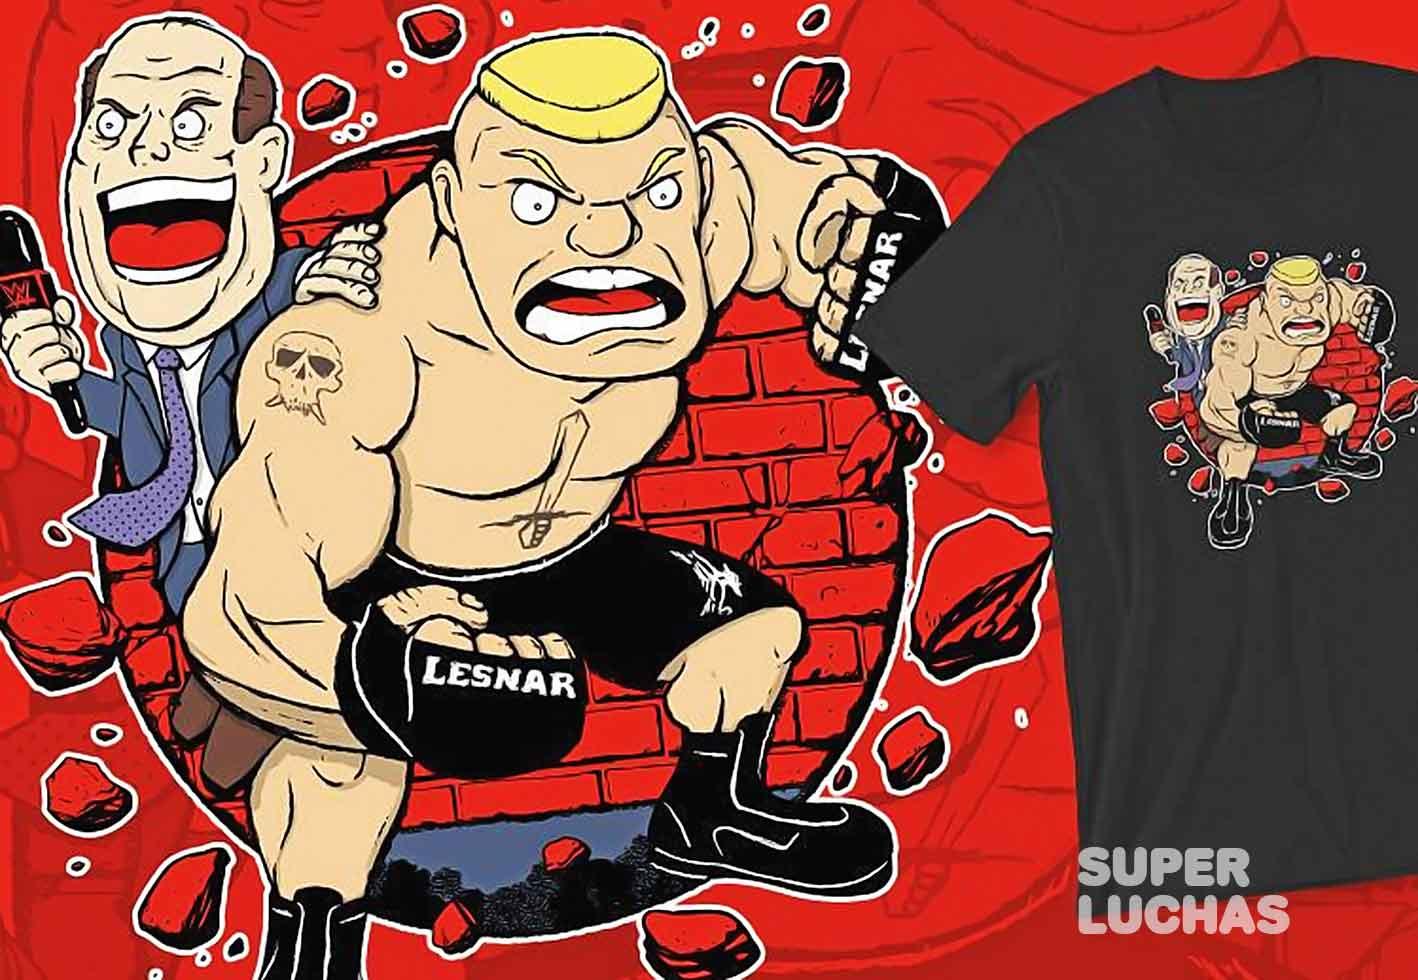 Camiseta de Brock Lesnar y Paul Heyman